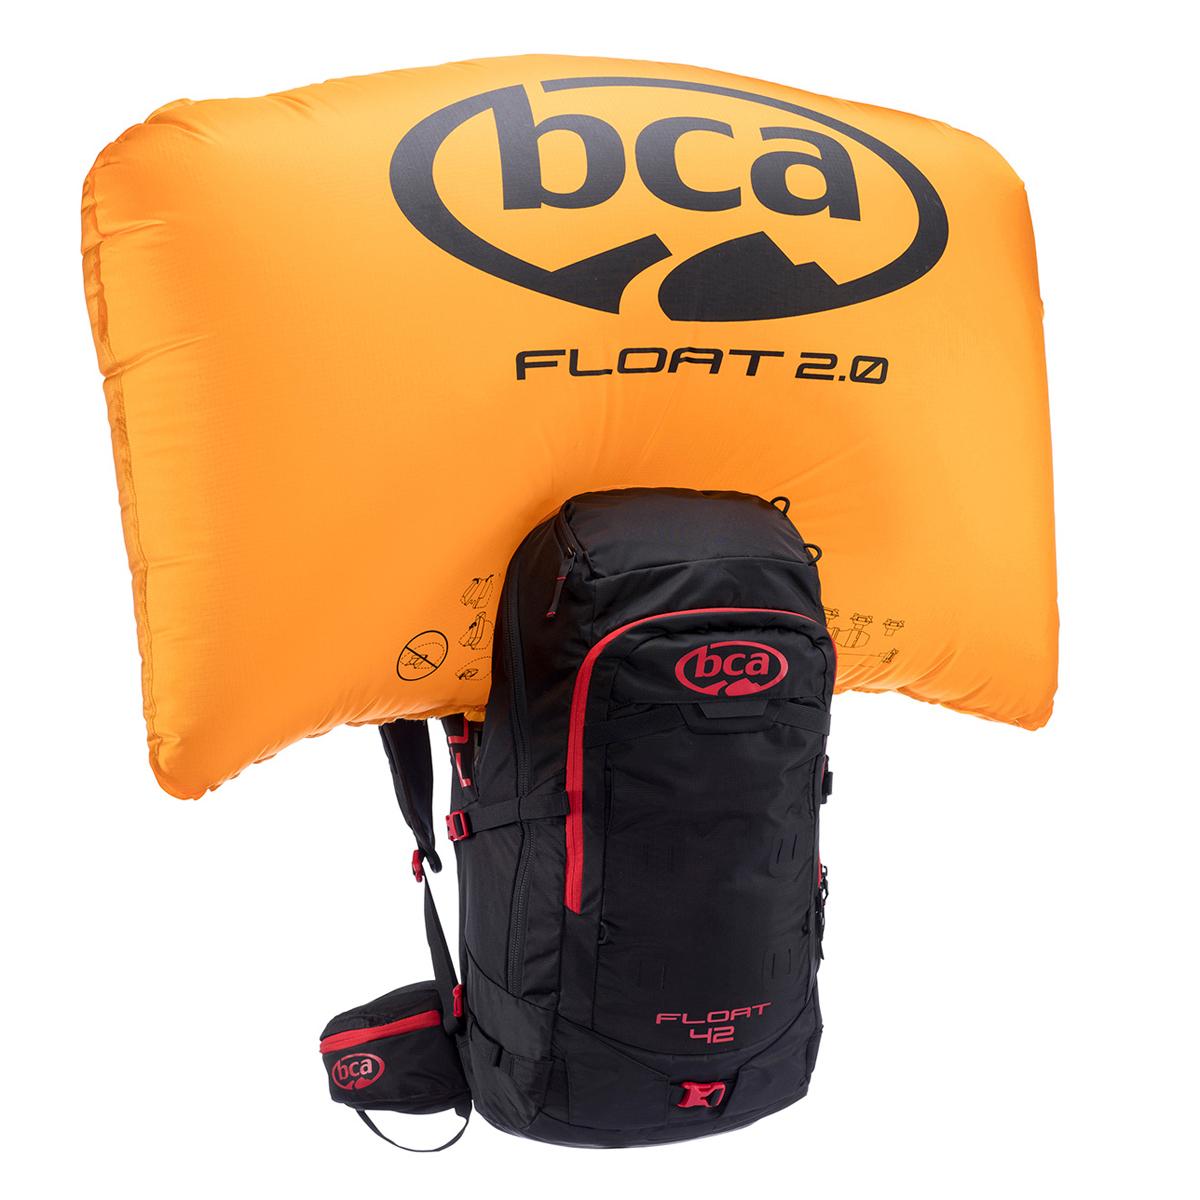 BCA_Float42_avalanche_airbag_deploy_1200x1200.jpg